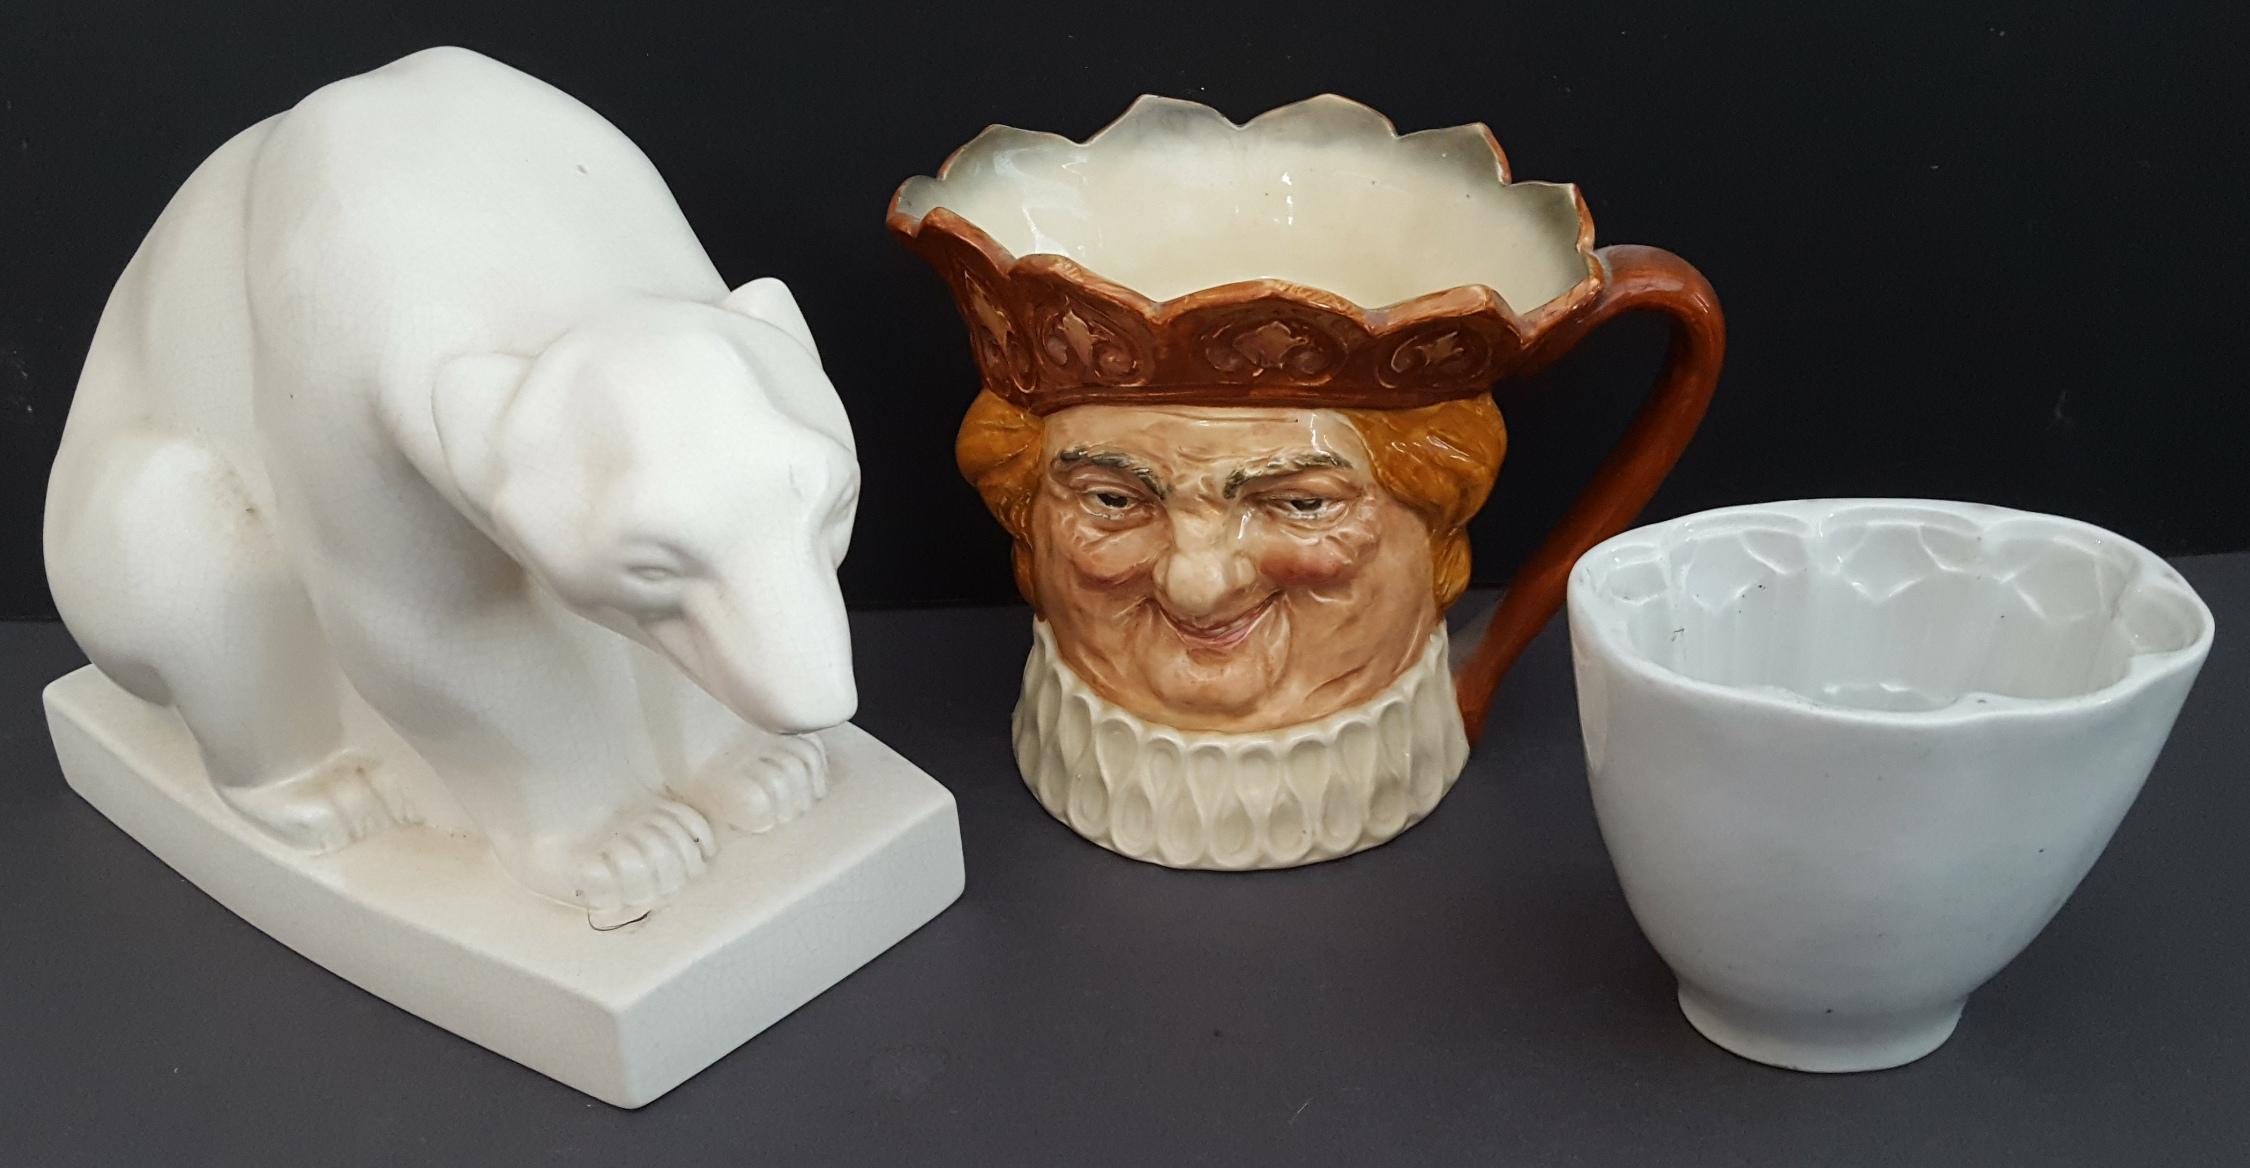 Antique Vintage Wedgwood Polar Bear Figure Royal Doulton Character Jug & Foley Jelly Mould